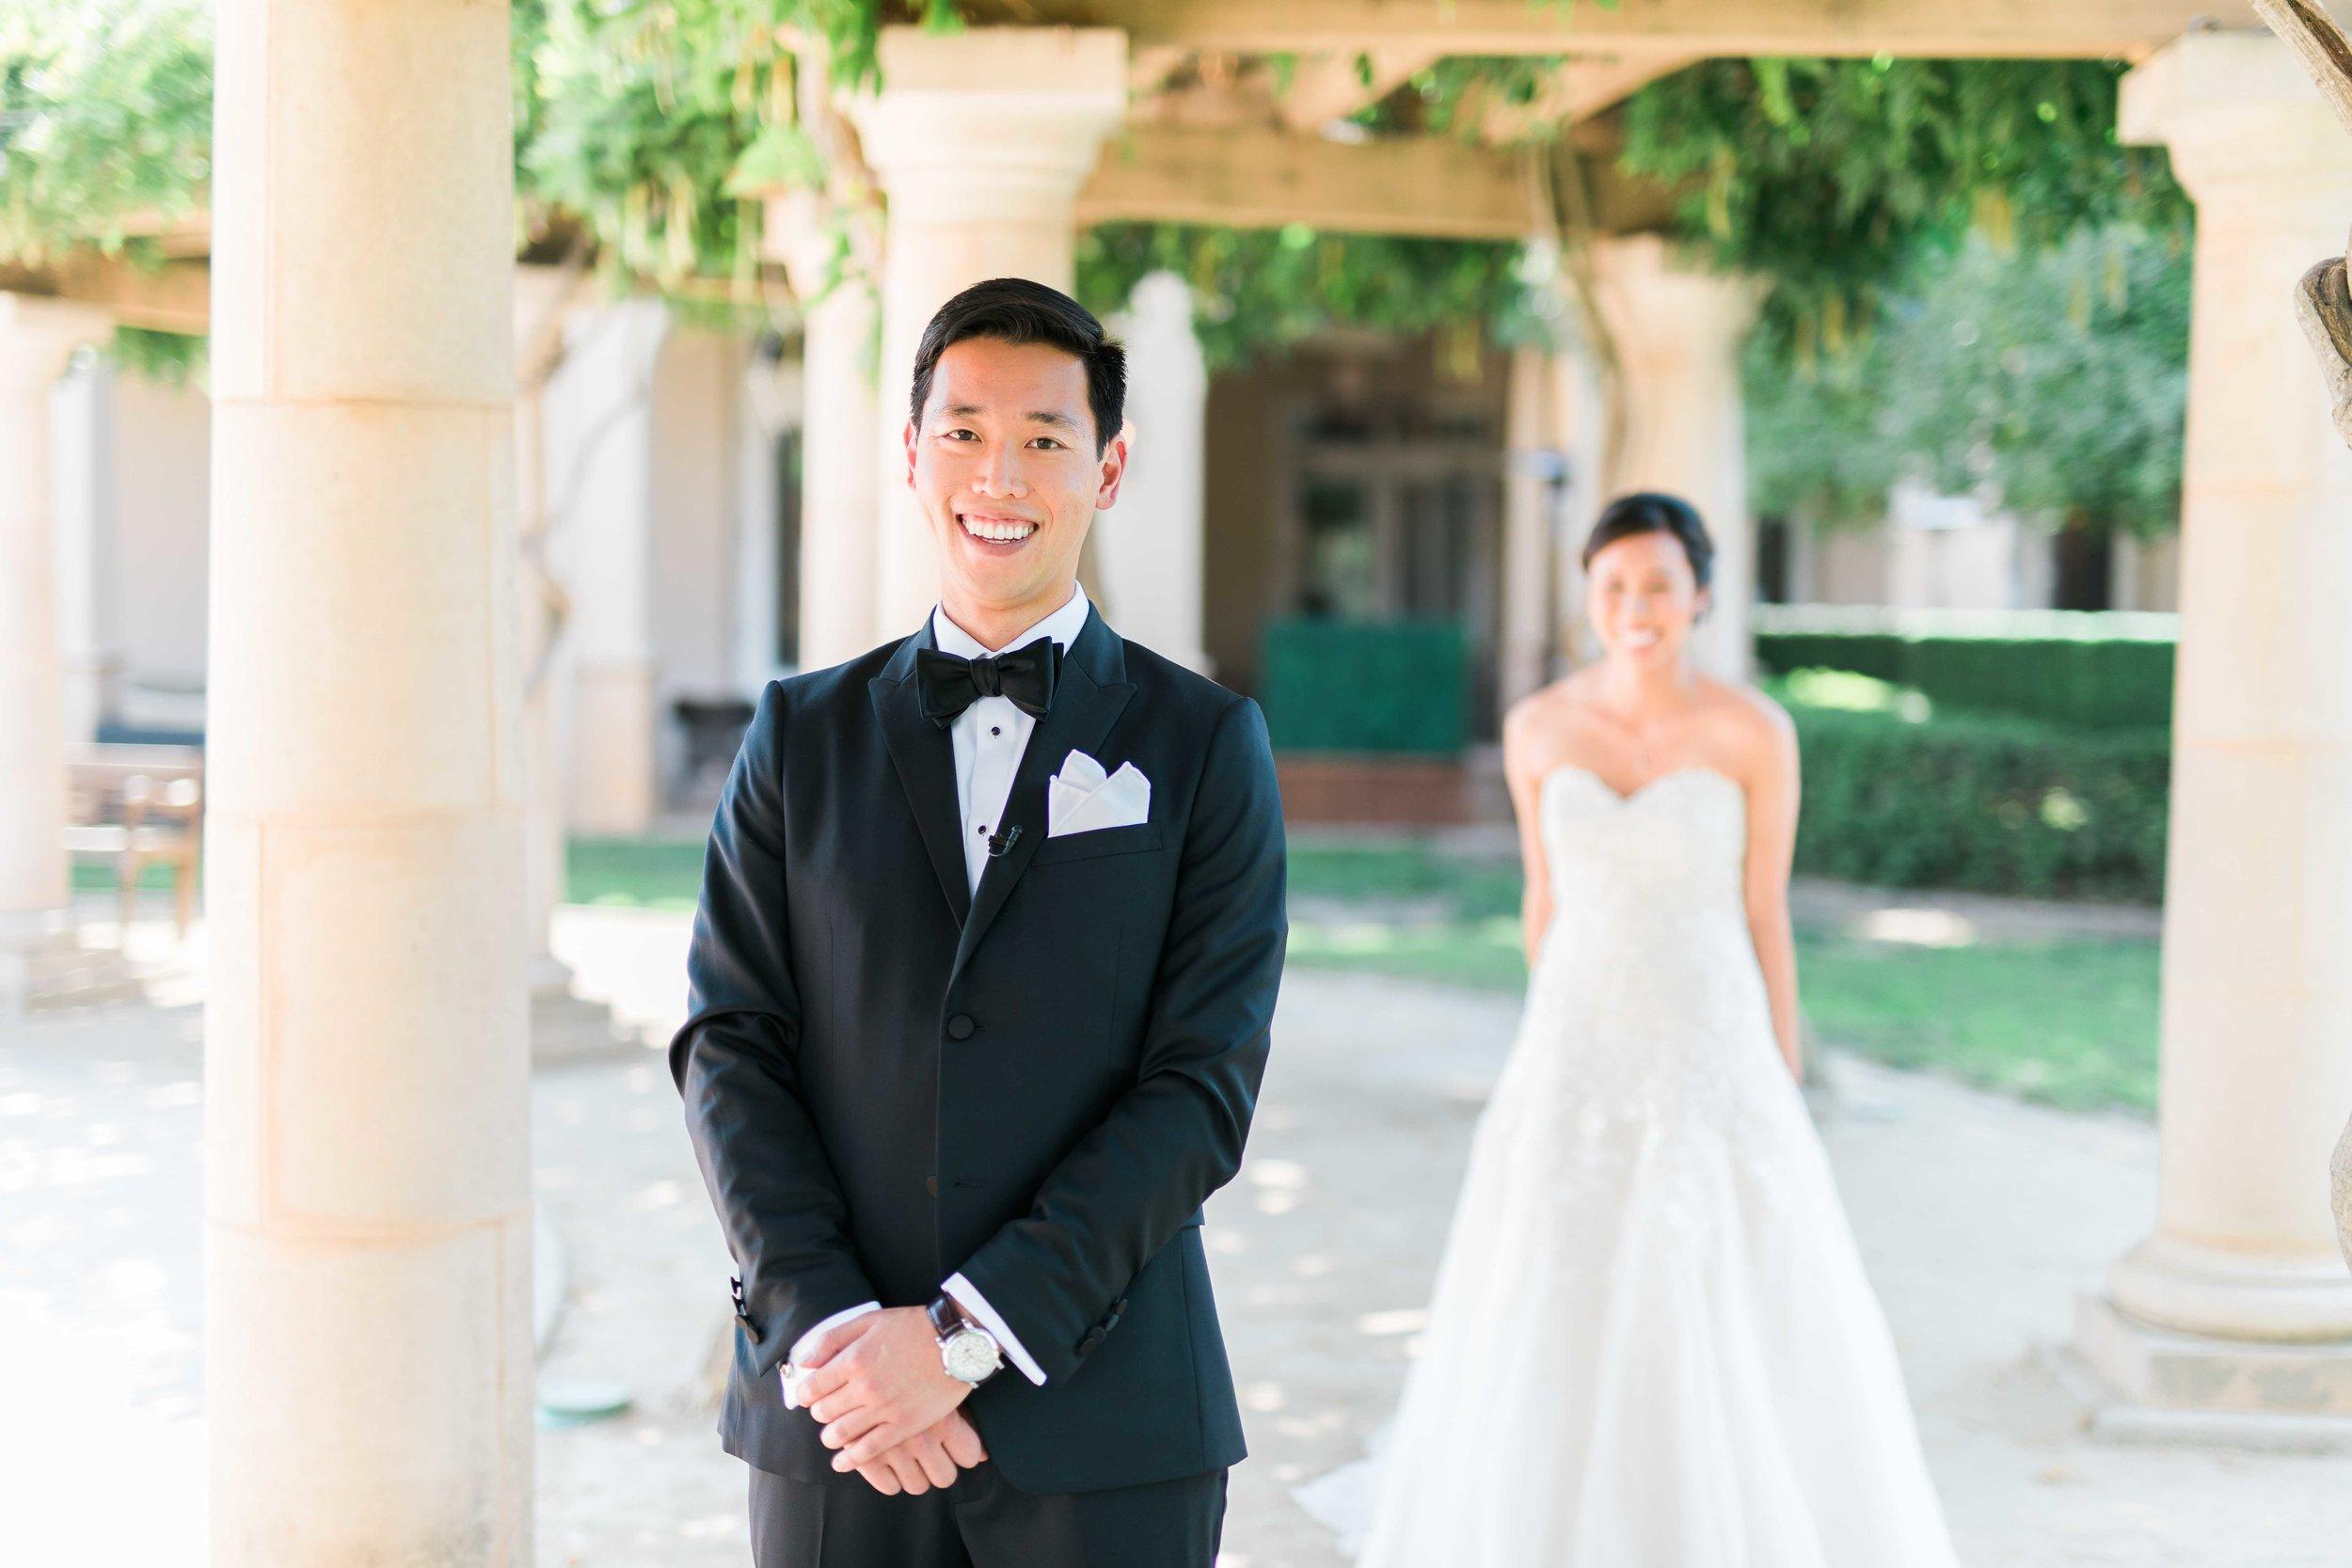 Ruby Hill Wedding Photos by JBJ Pictures - San Francisco Wedding Photographer - Pleasanton Wedding Venue (18).jpg